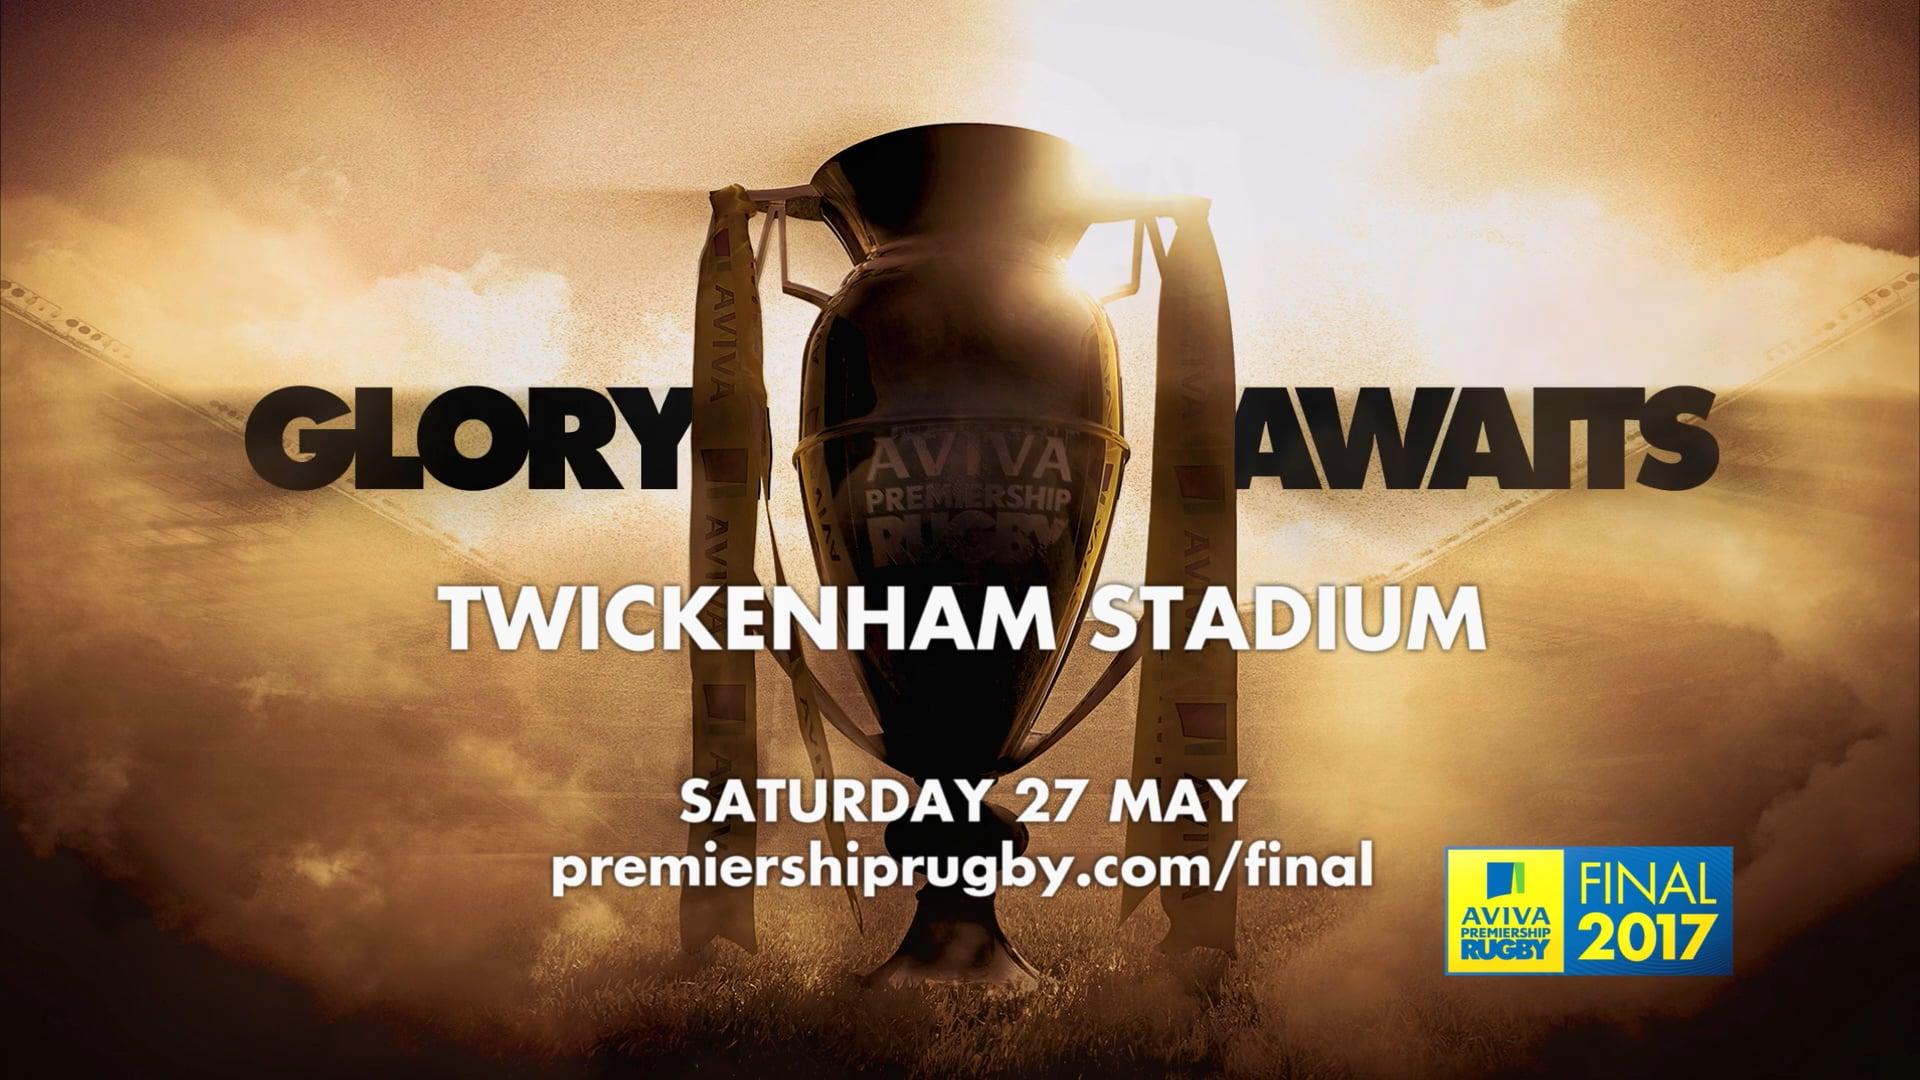 Premiership Rugby - Glory Awaits